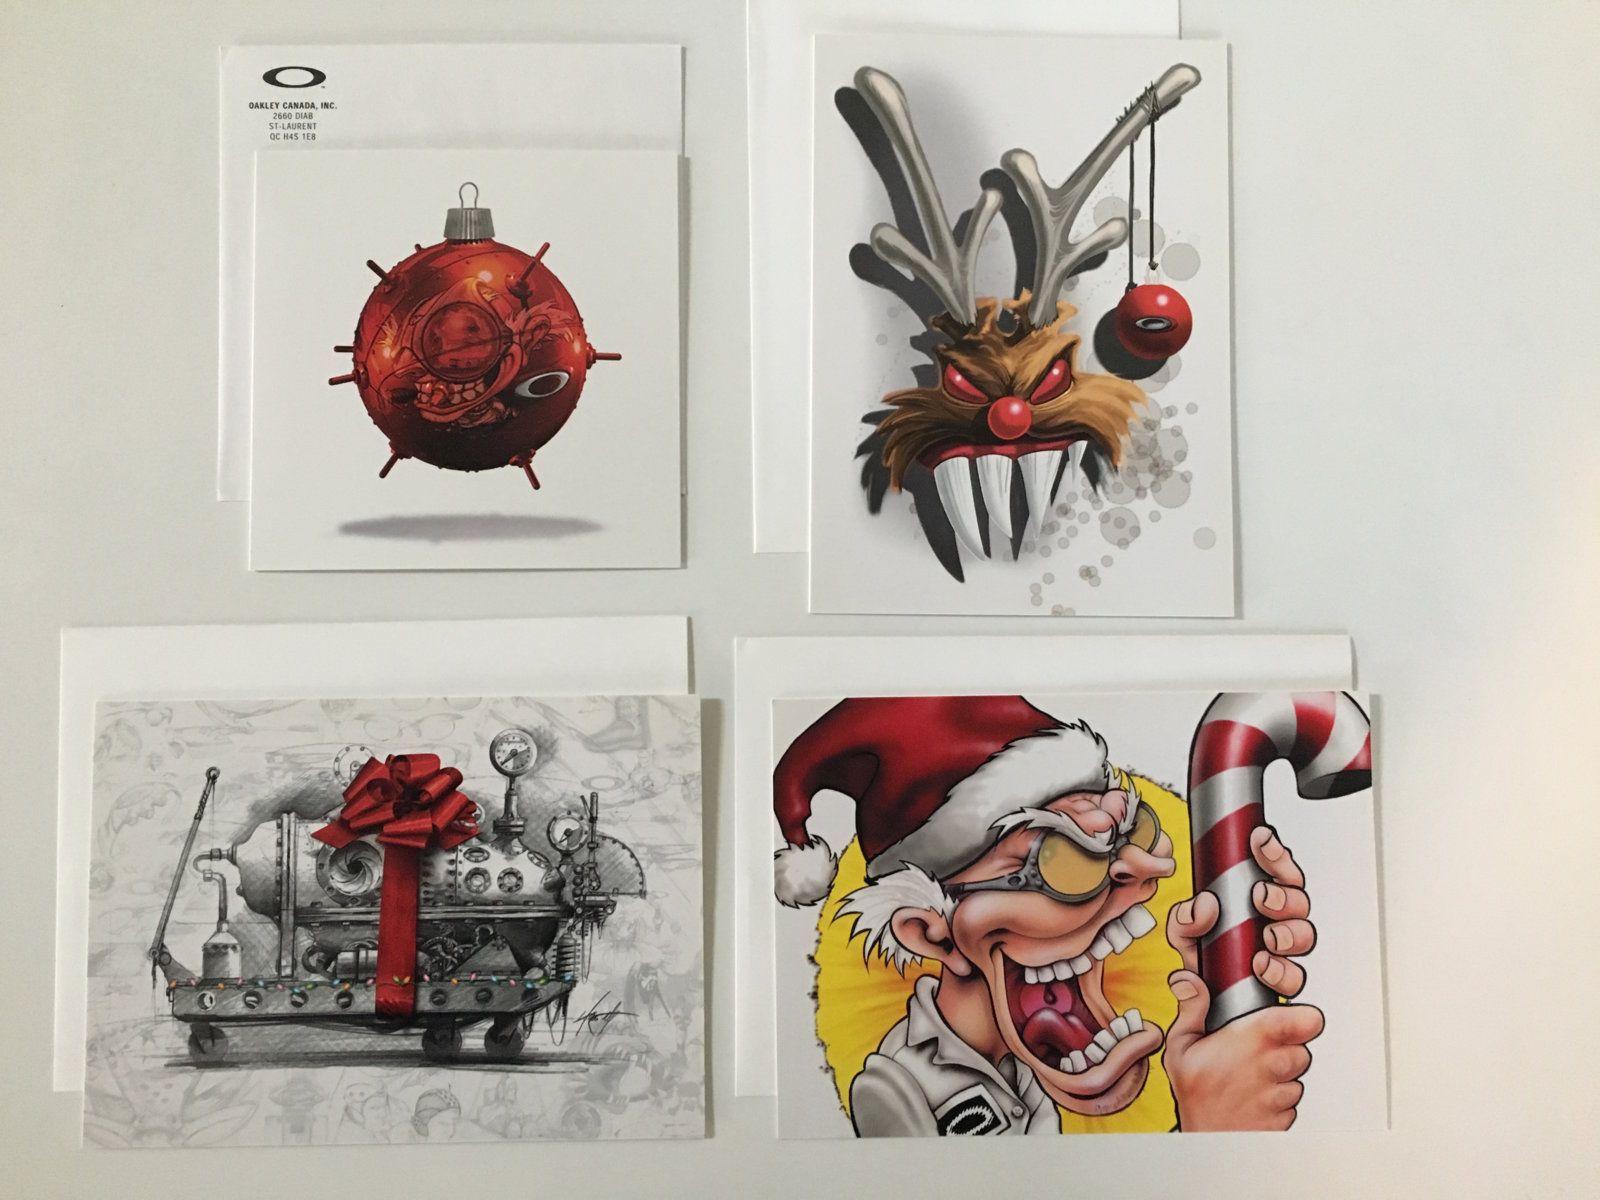 Part 2 - Random Stuff Sale!  Watches, Christmas Cards, Older Eyewear and More! - Christmas.JPG